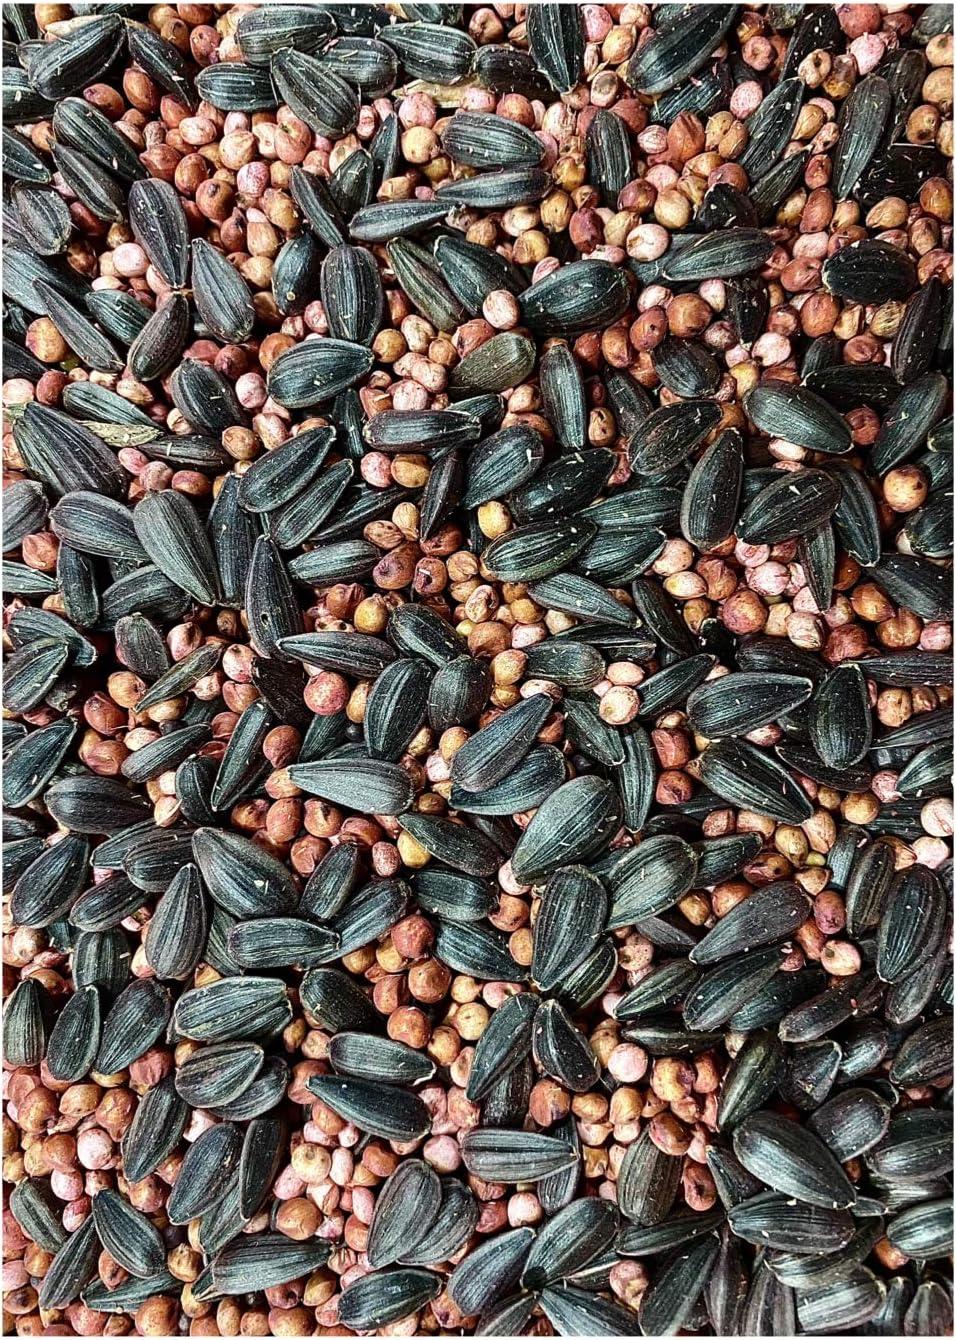 25lb Food Plot Seed Mix Red Grain Peredovik 返品交換不可 Sorghum Sunflowers ランキング総合1位